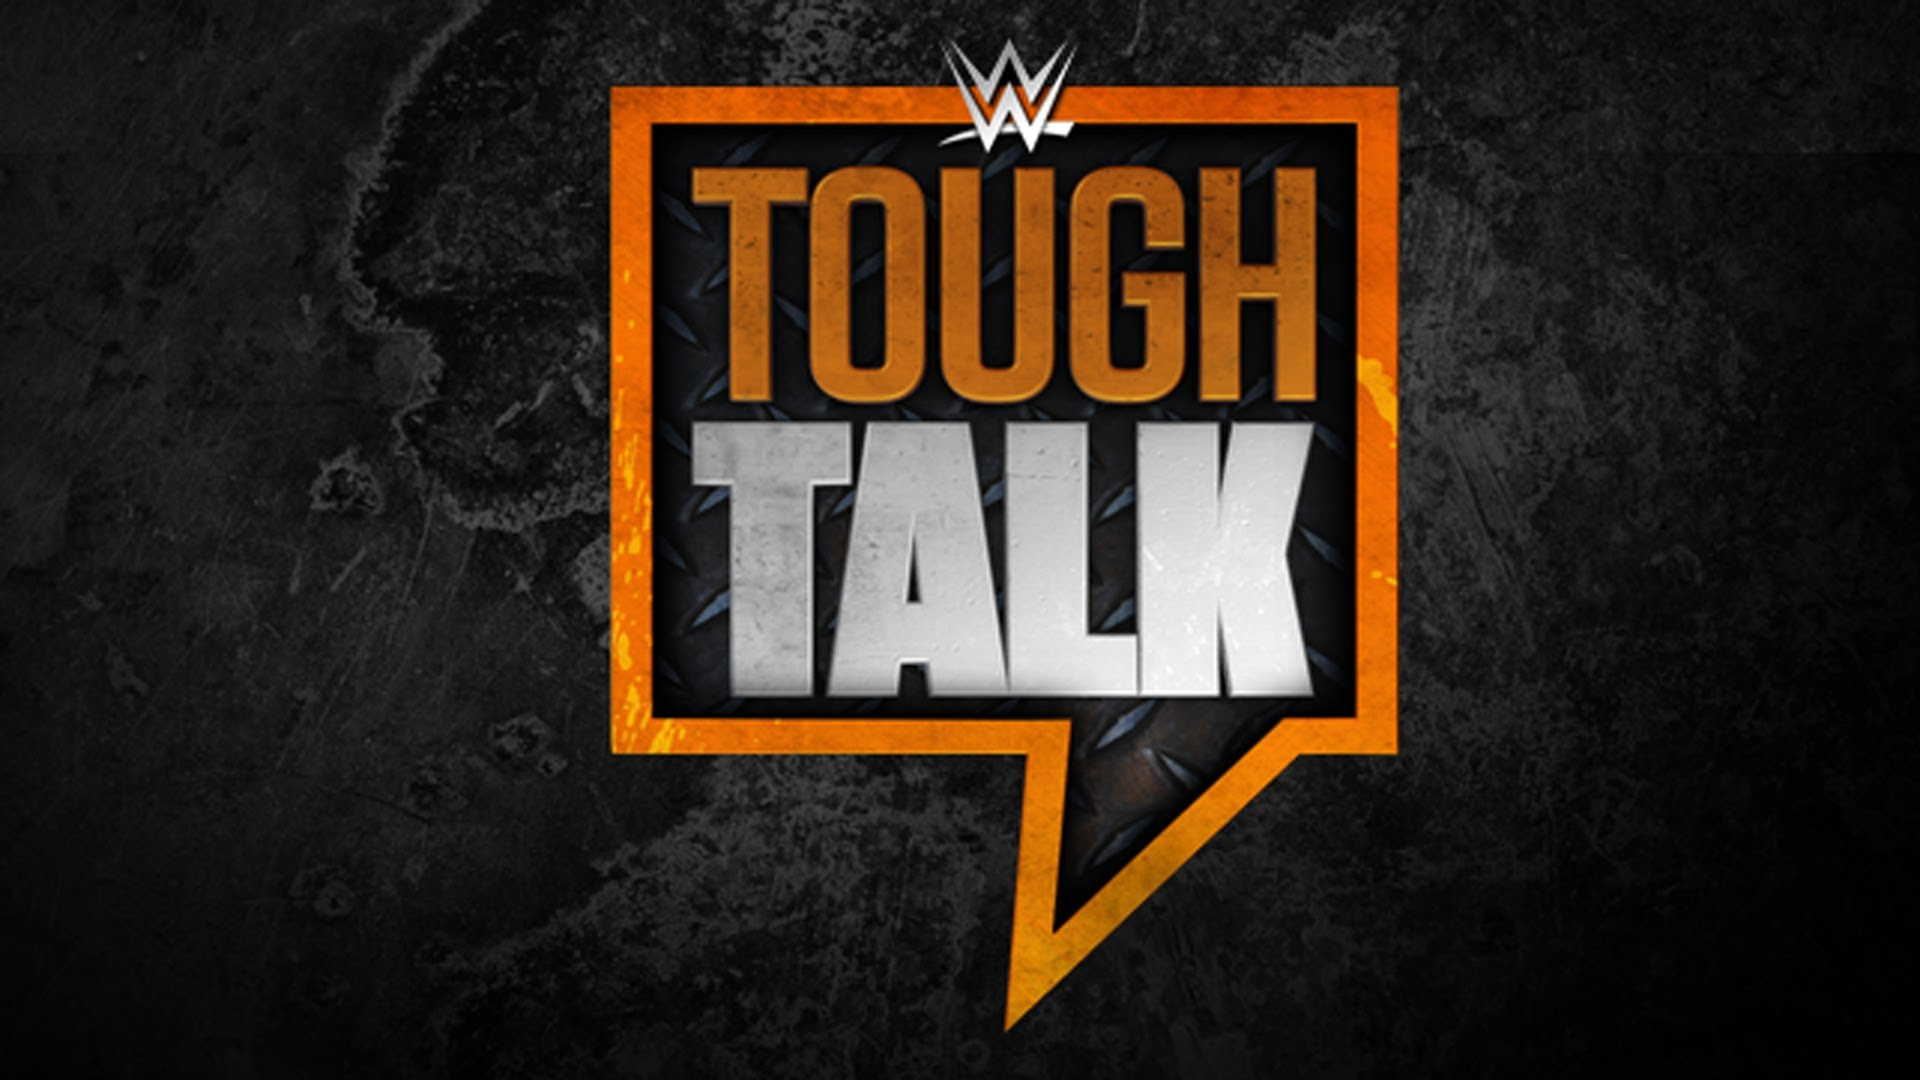 WWE Network: Tough Talk, August 4, 2015